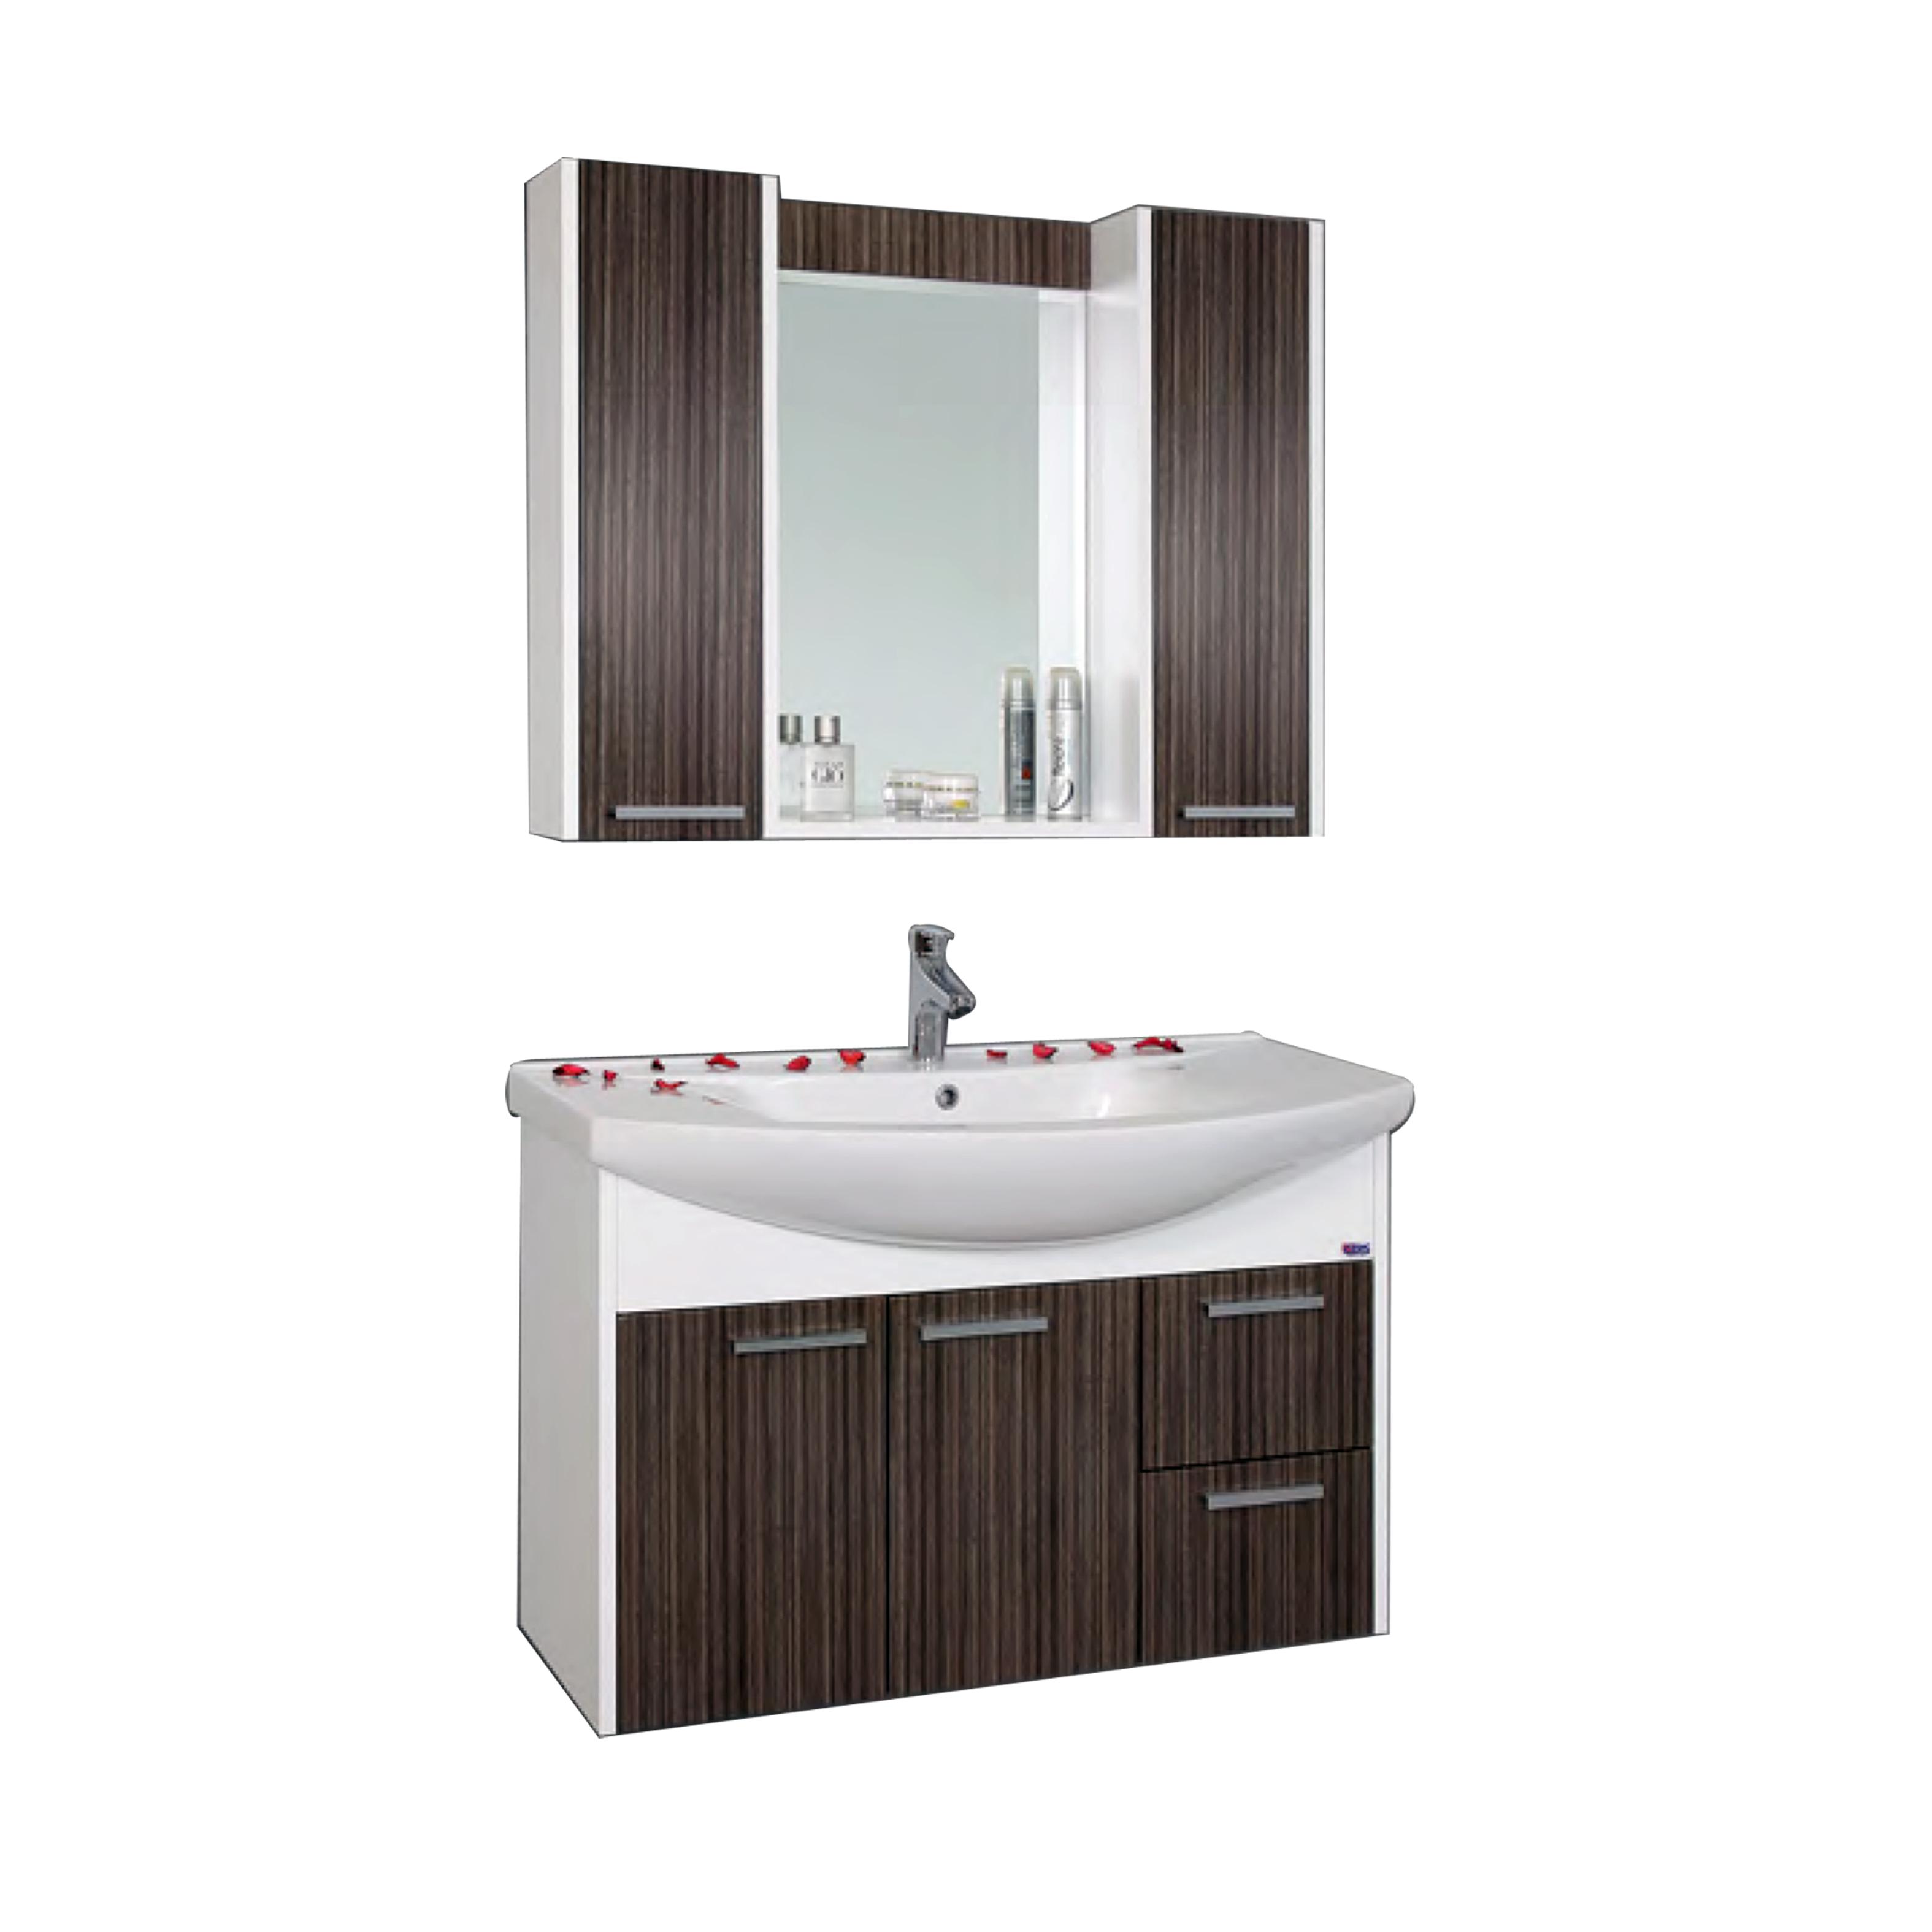 Cheap Bathroom Furniture Cabinet Made In Turkey Seize 95x35x190cm Duru Bathroom Vanities Buy Bathroom Vanity Cabinets Bathroom Cabinet Ready Made Bathroom Cabinet Product On Alibaba Com